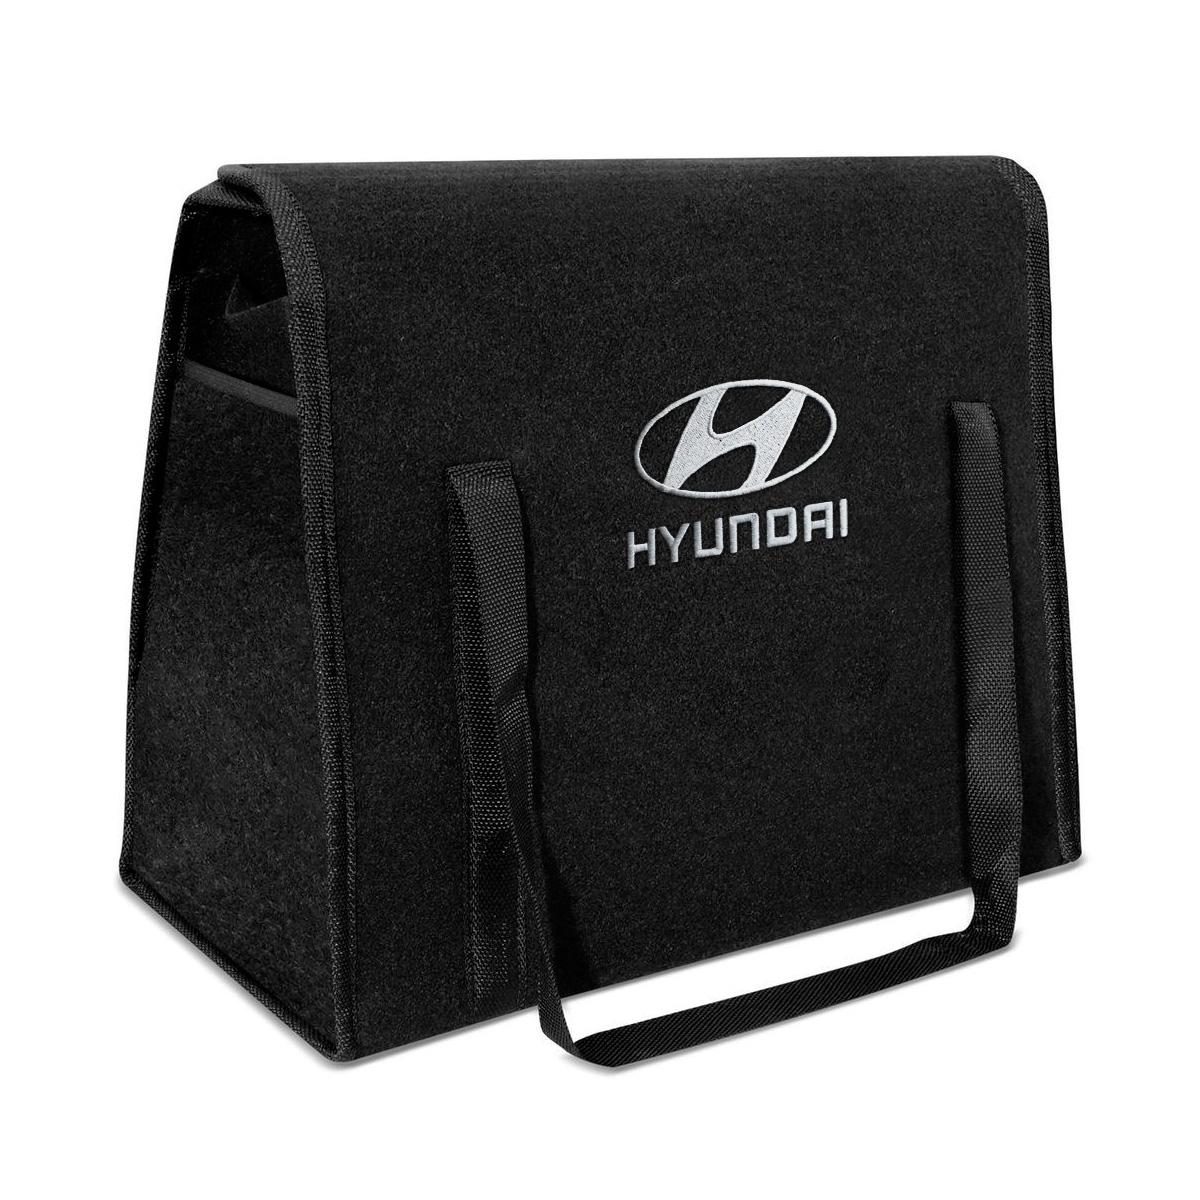 Bolsa Organizadora Porta Malas Logo Hyundai Carpete Preto 20 Litros